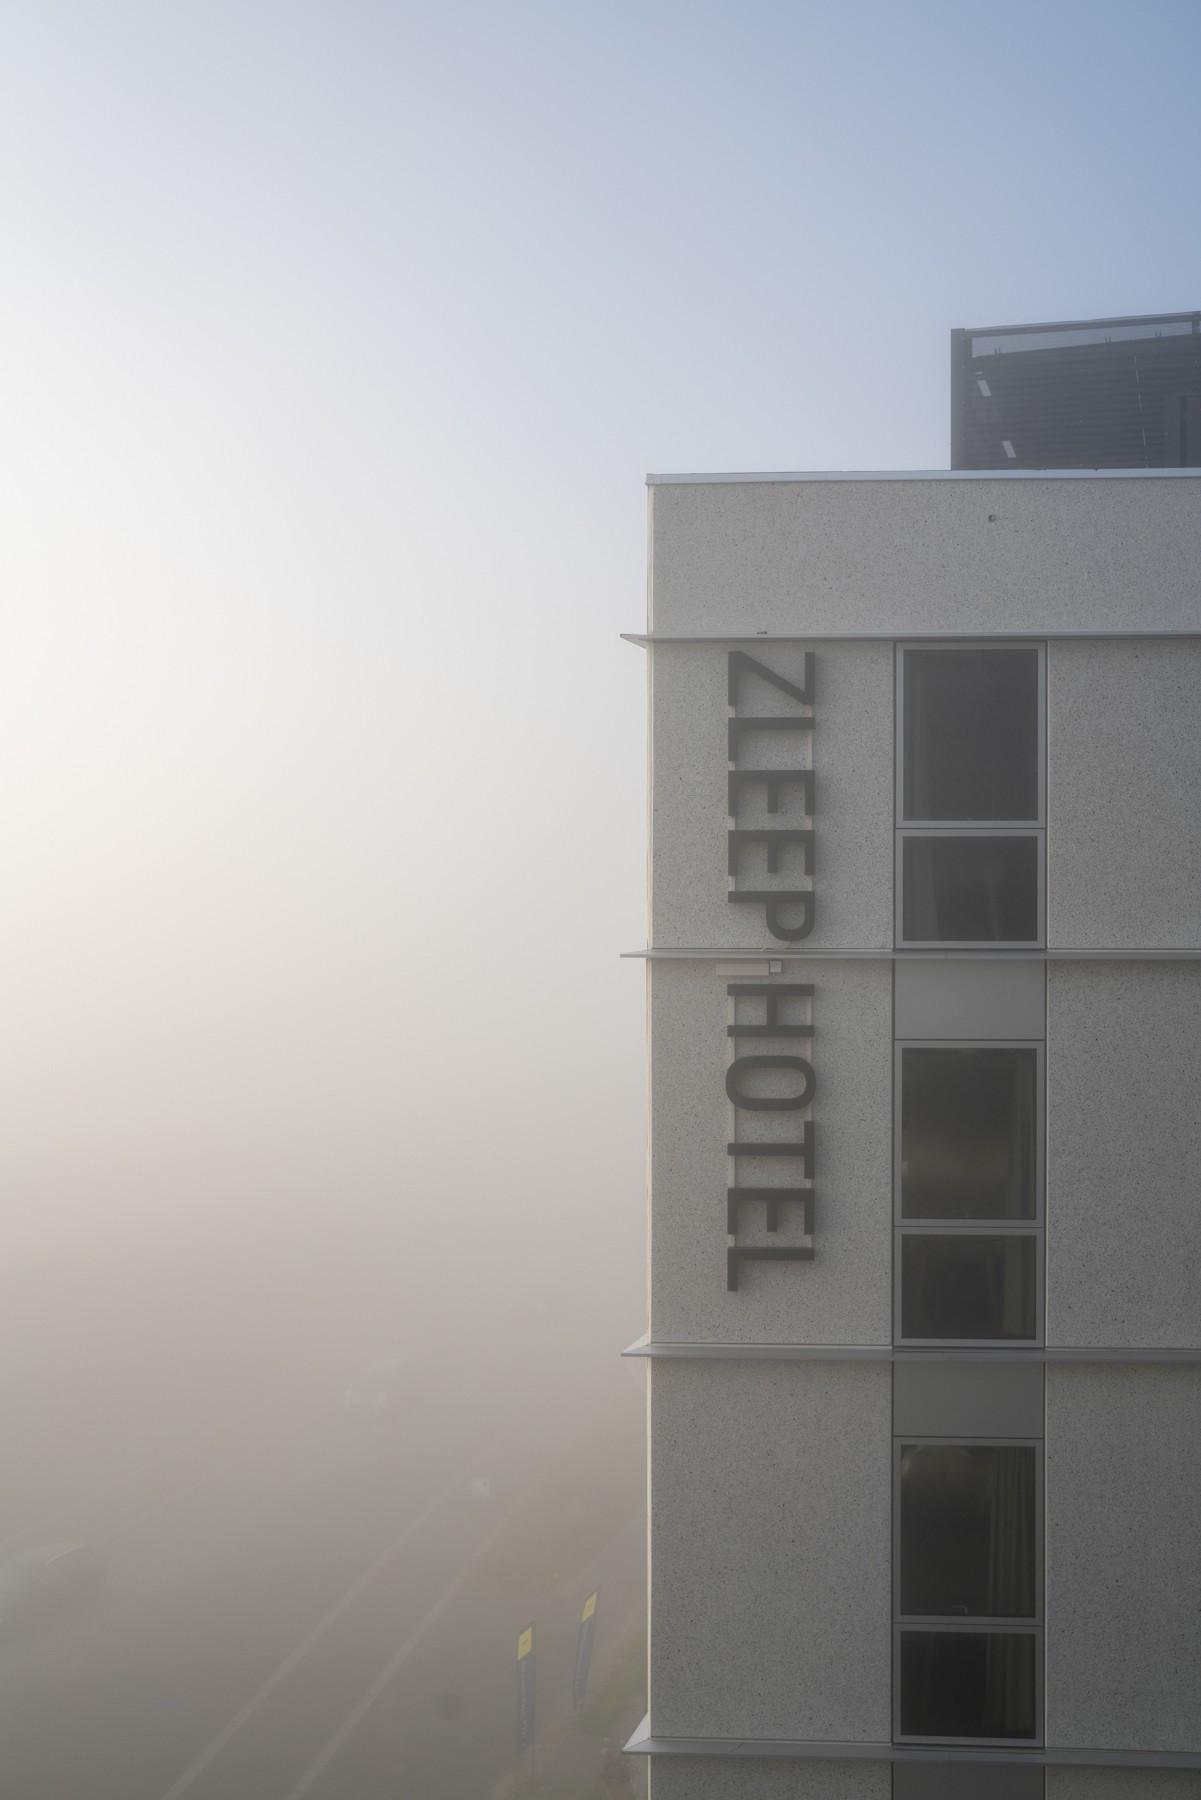 Det nye Zleep hotel på Ørestad Boulevard